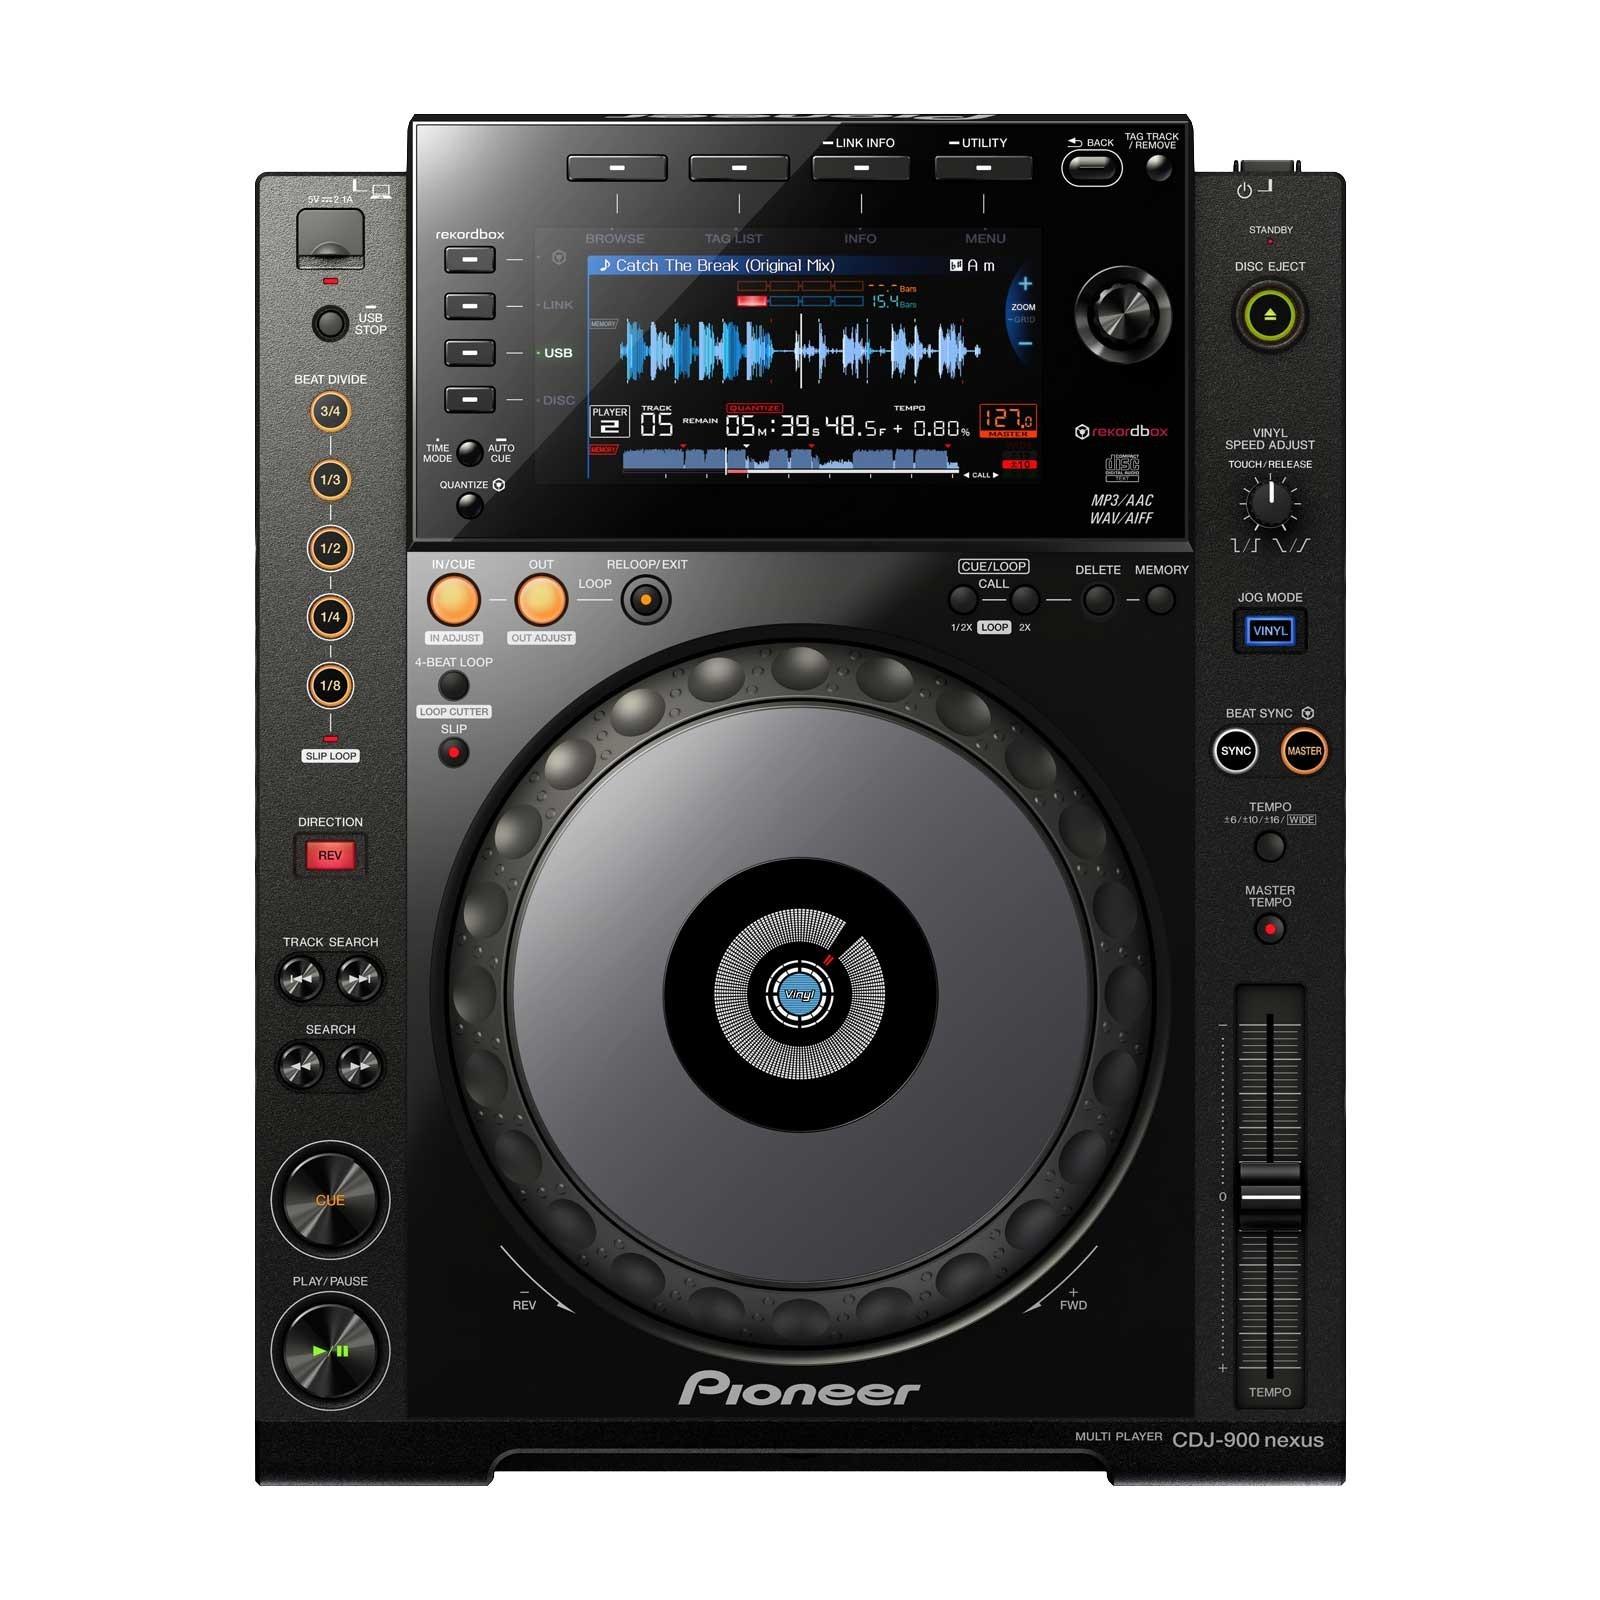 pioneer dj cdj 900nxs digital dj cd player with wi fi playback chicago dj shop. Black Bedroom Furniture Sets. Home Design Ideas